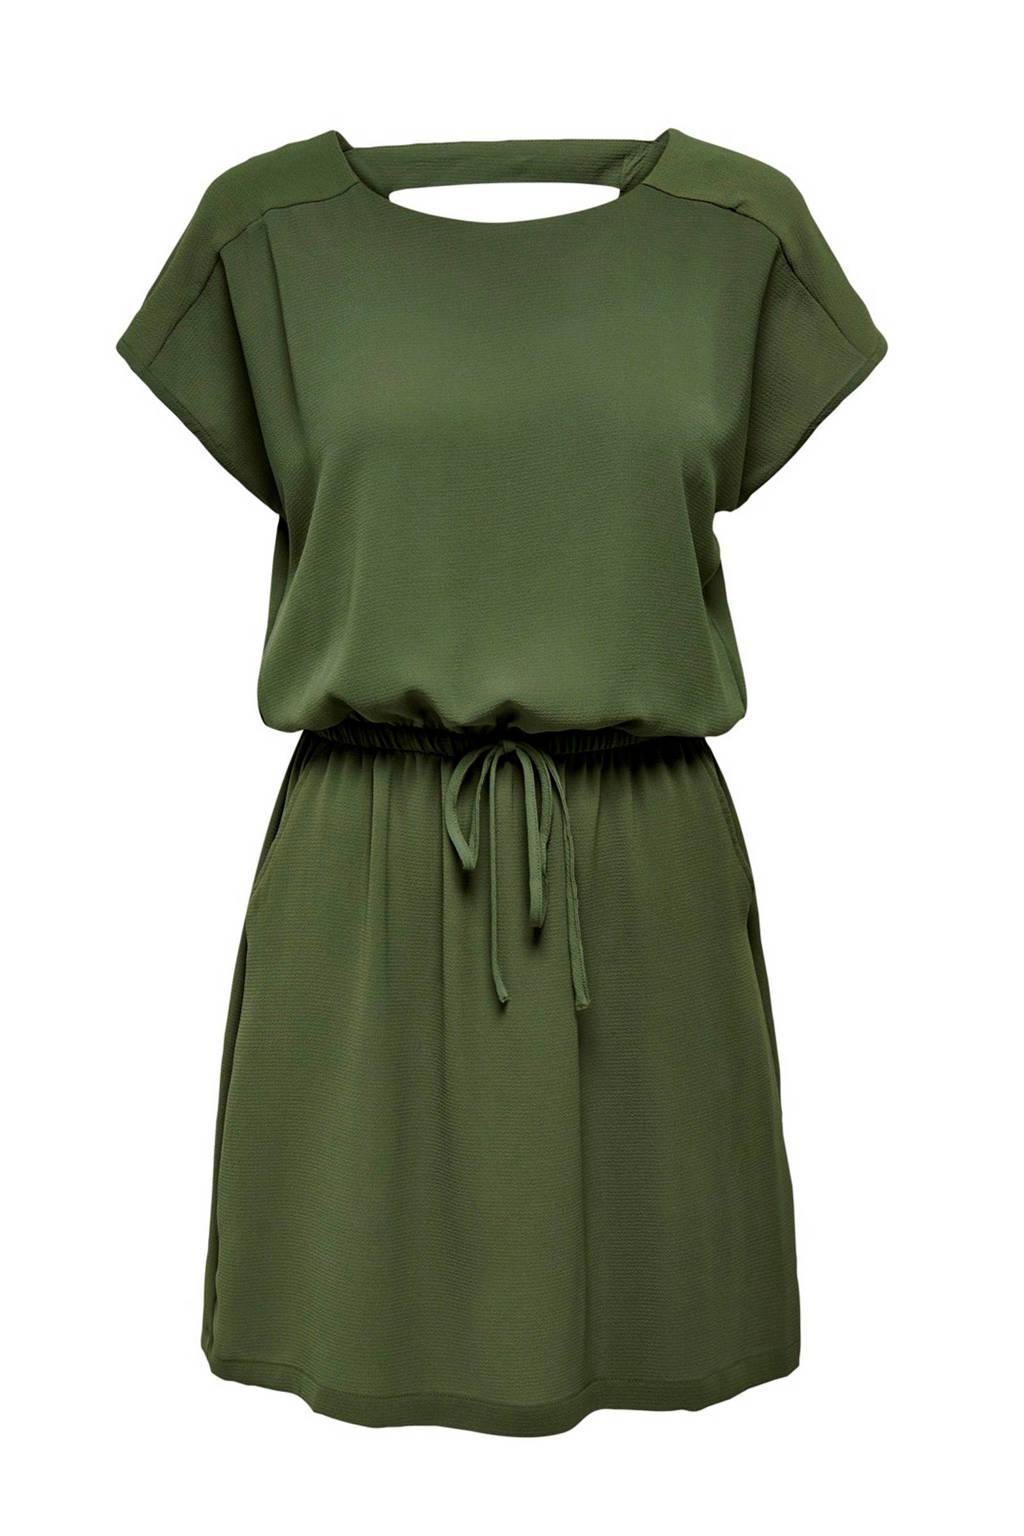 ONLY jurk met open detail, Groen